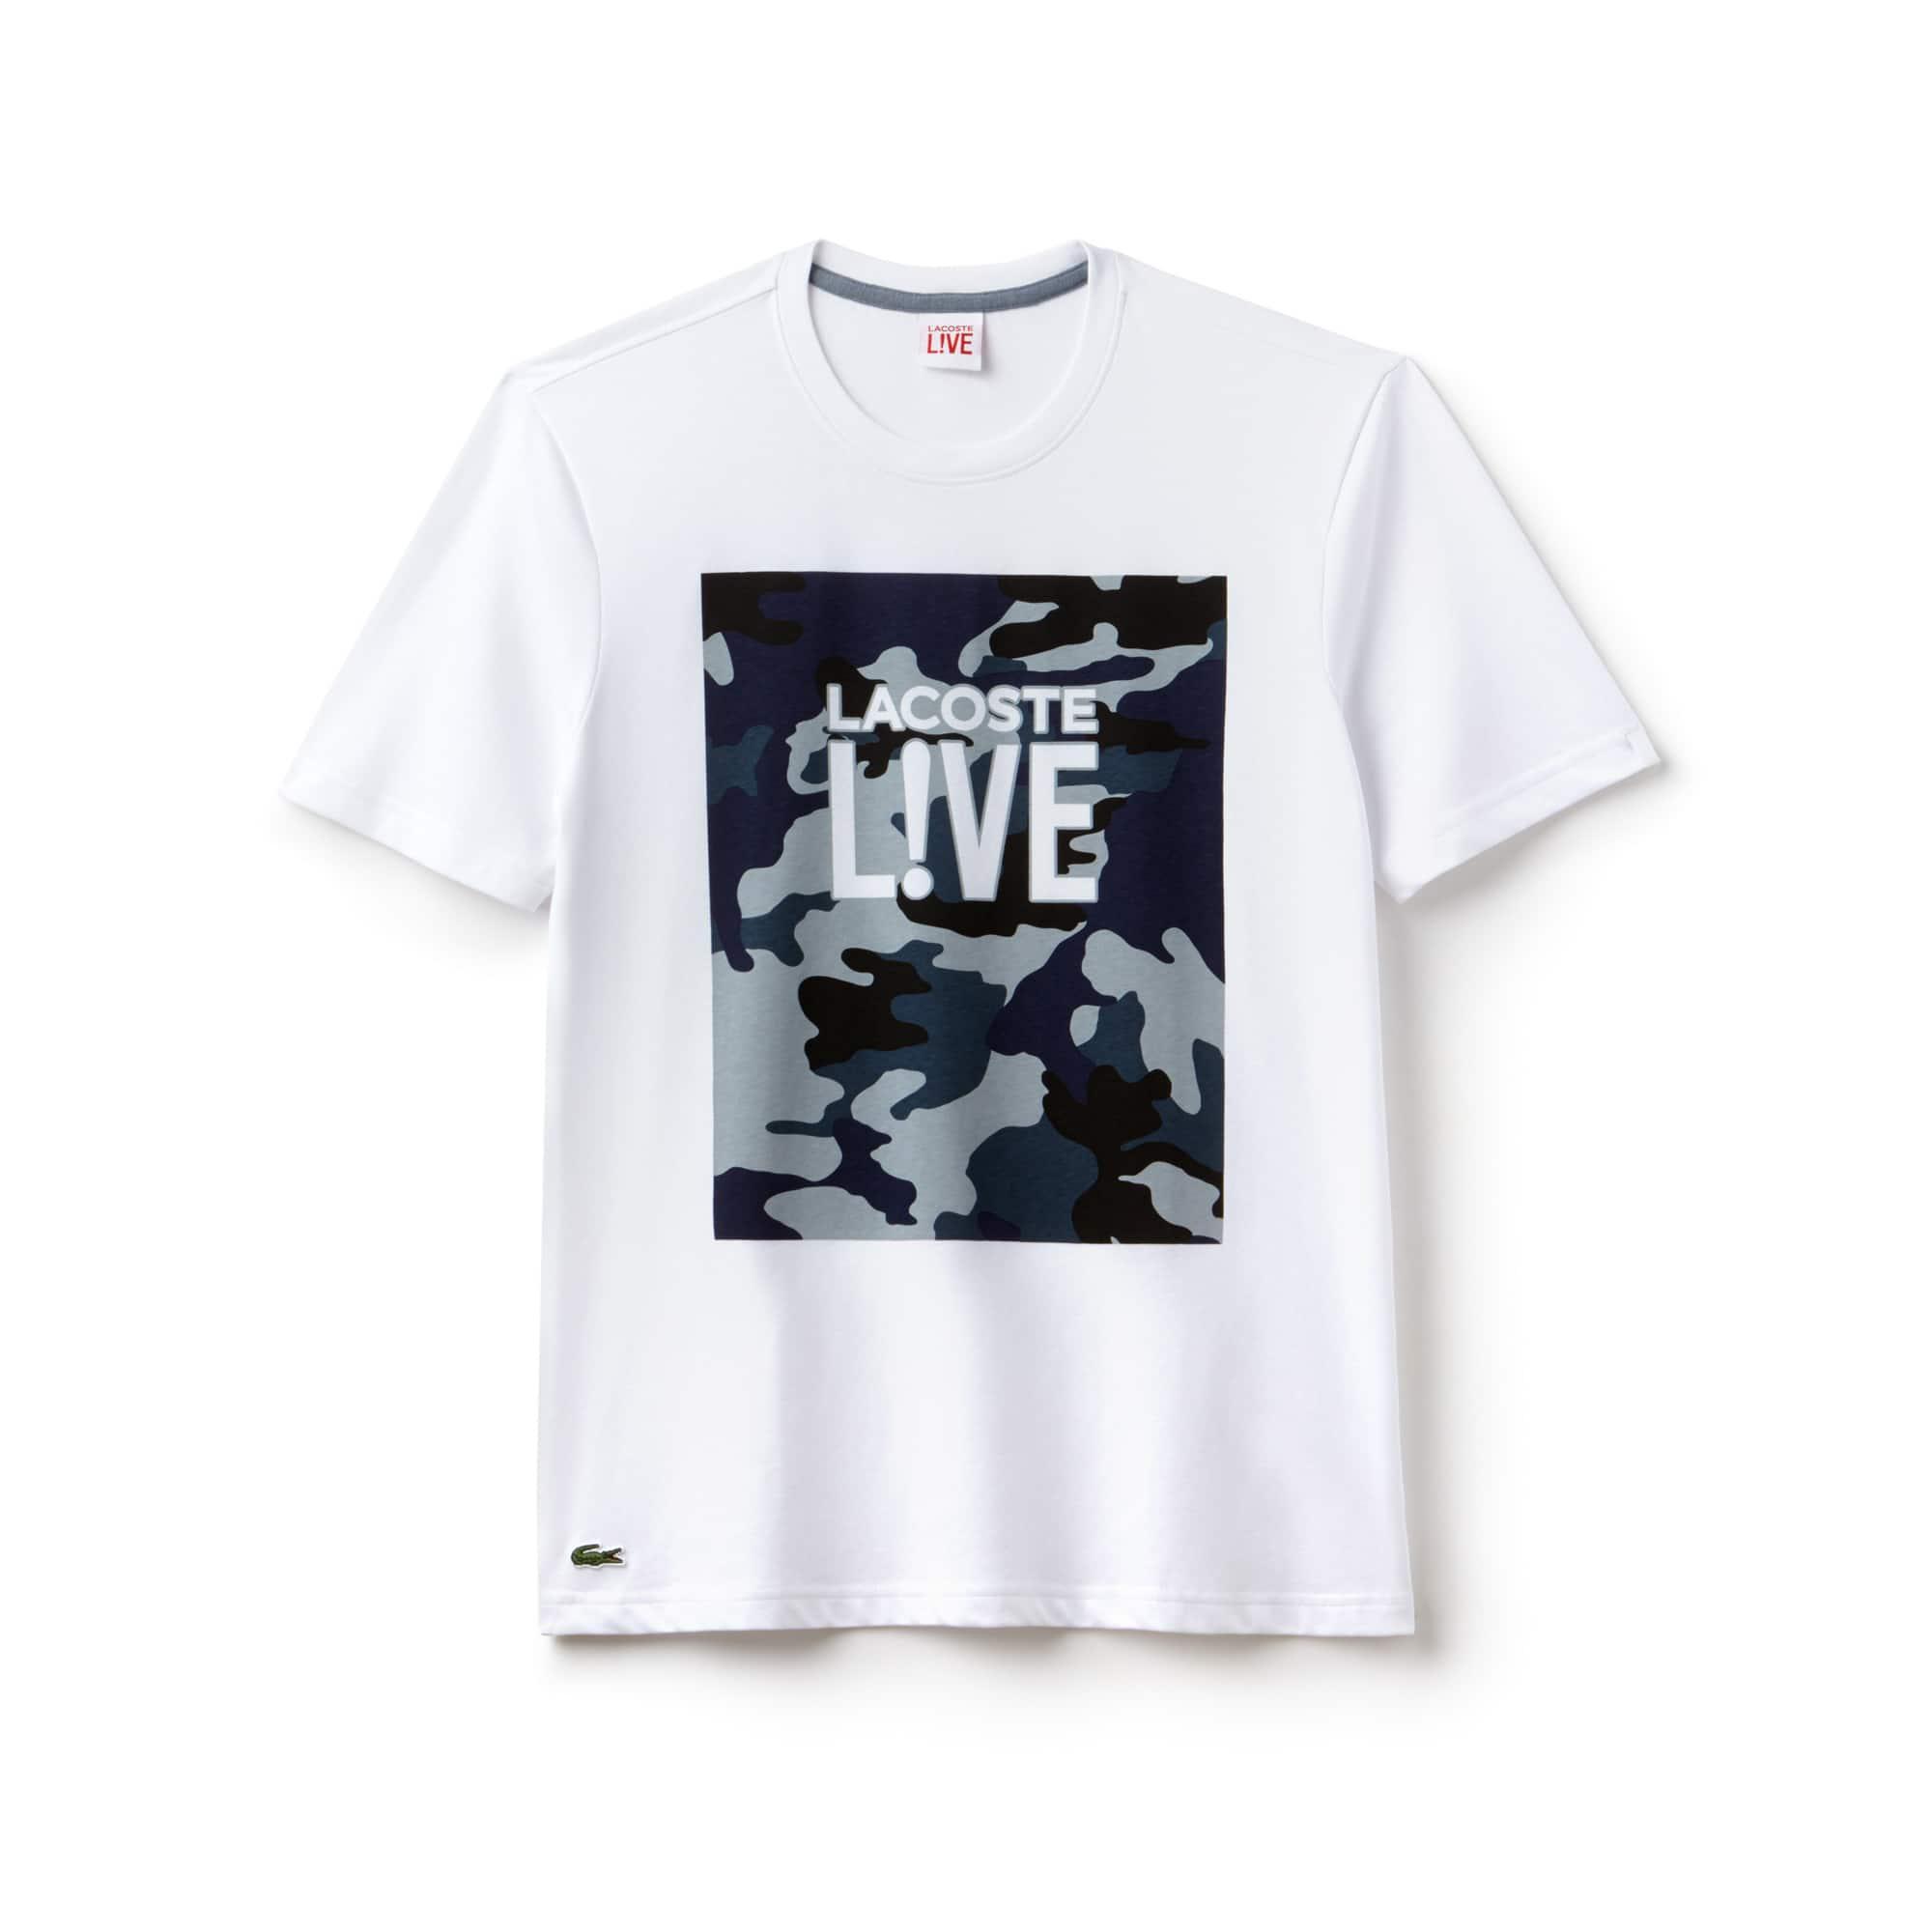 T-shirt a girocollo Lacoste LIVE in jersey con stampa del marchio